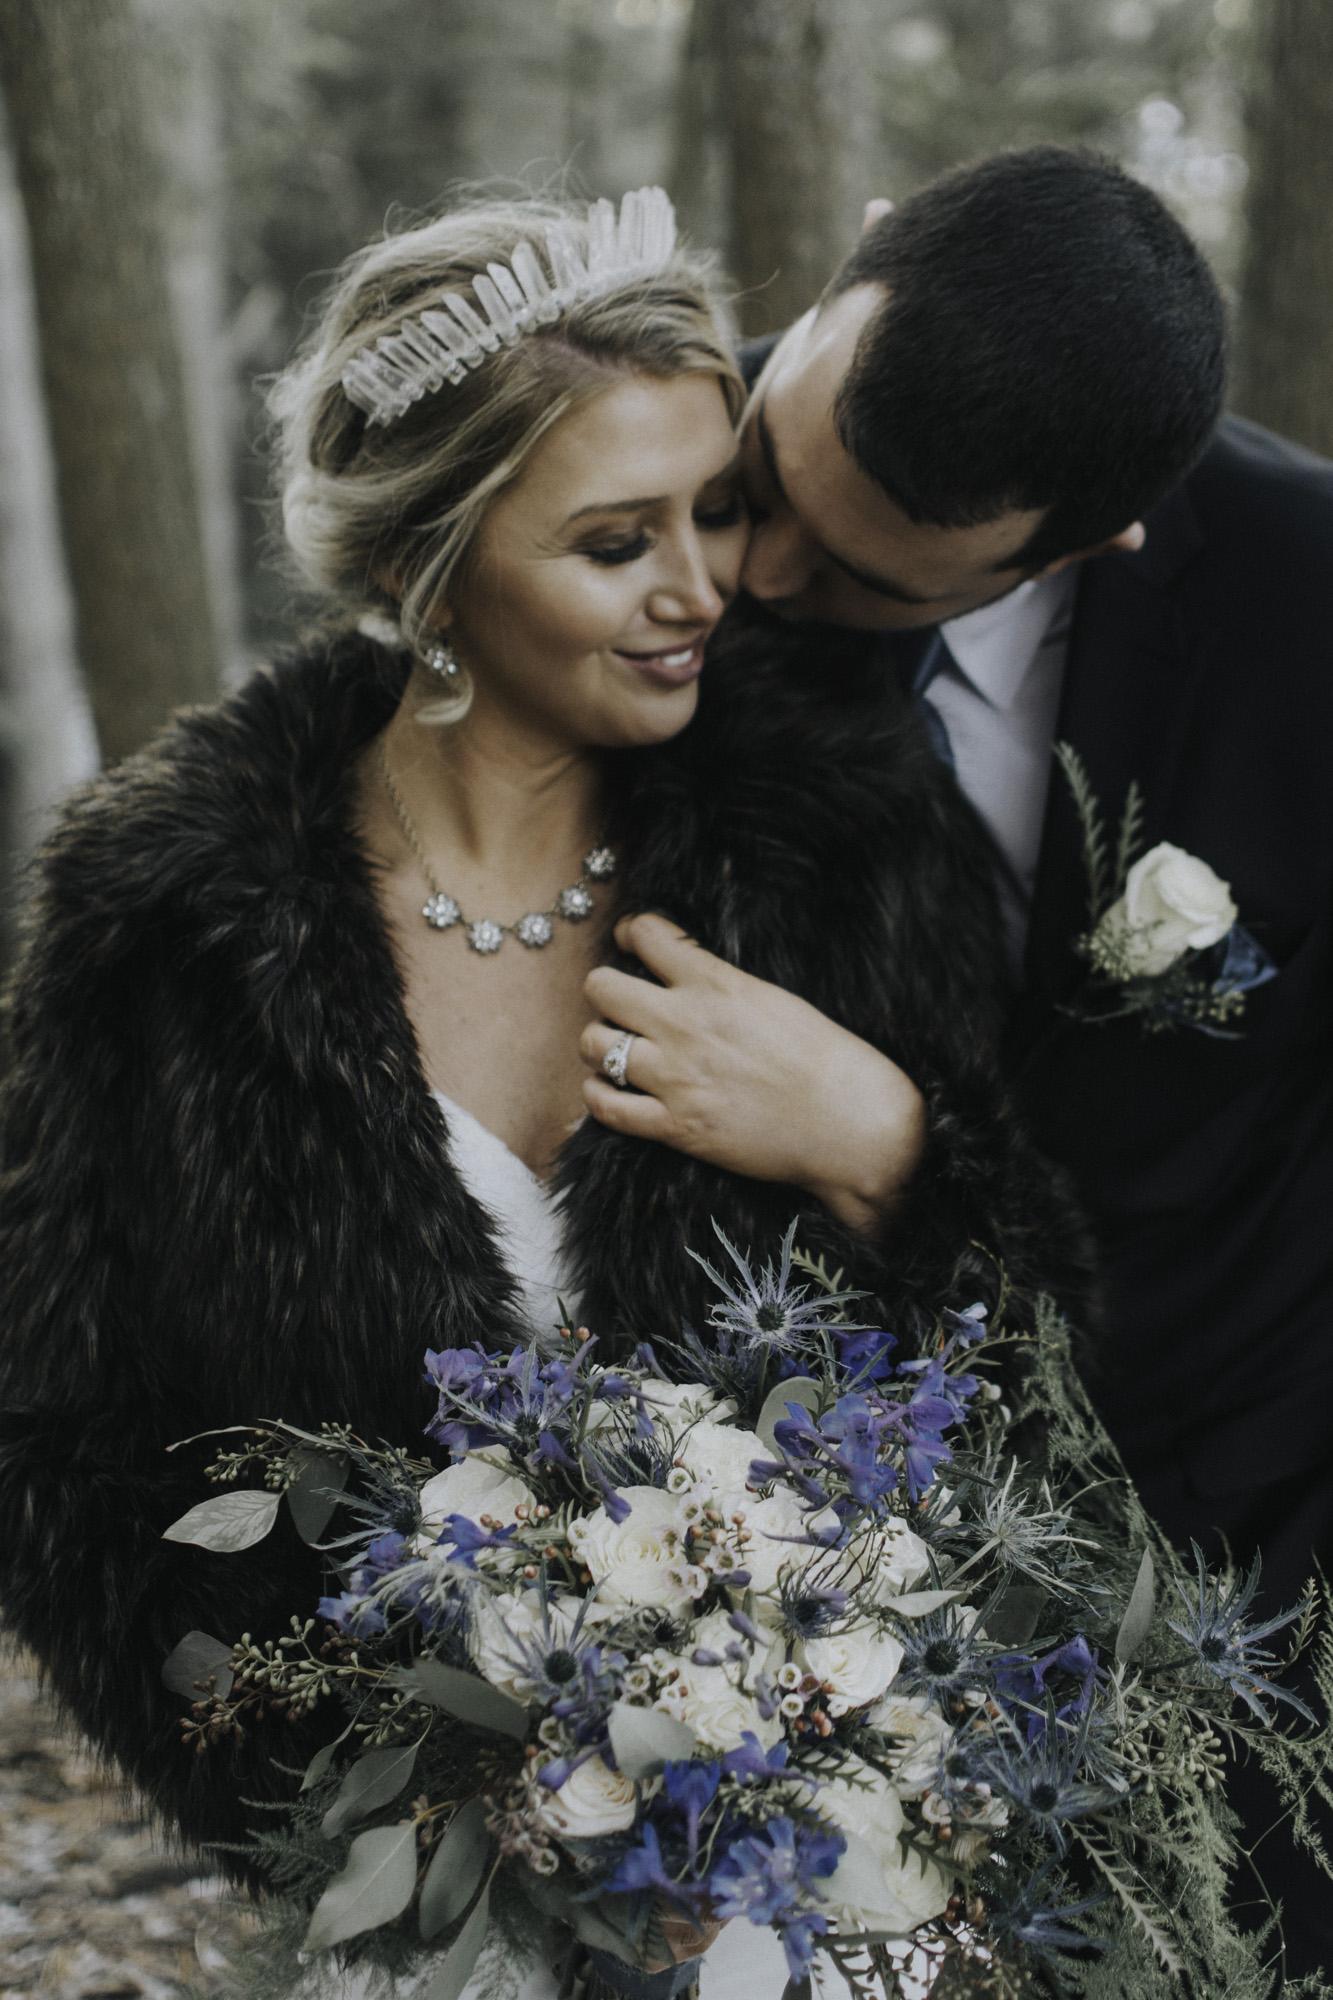 Cate_Ann_Photography_Dayton_Ohio_Wedding_Elopement_And_Engagement_PhotographerDSC_6103.jpg